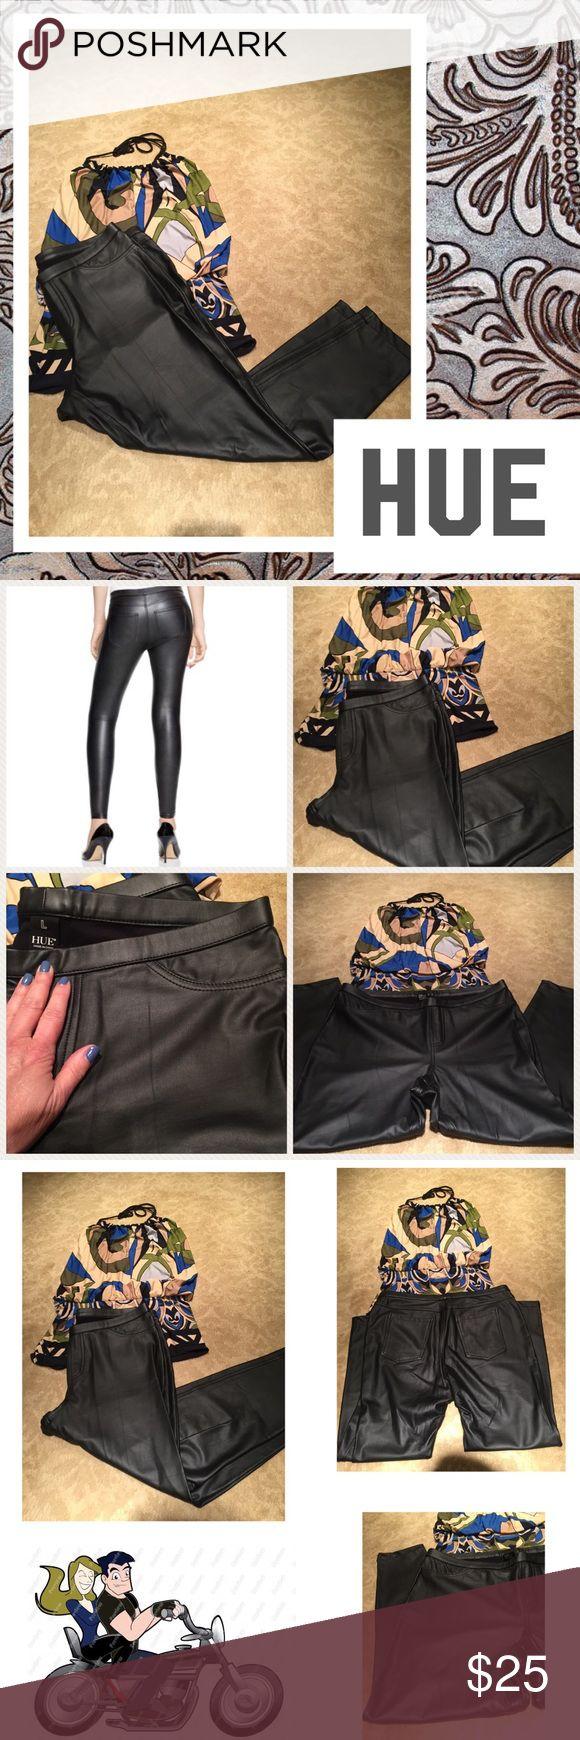 🏍HUE faux leather leggings🏍 Black faux leather HUE leggings. Flat front w back pockets. HUE Pants Leggings